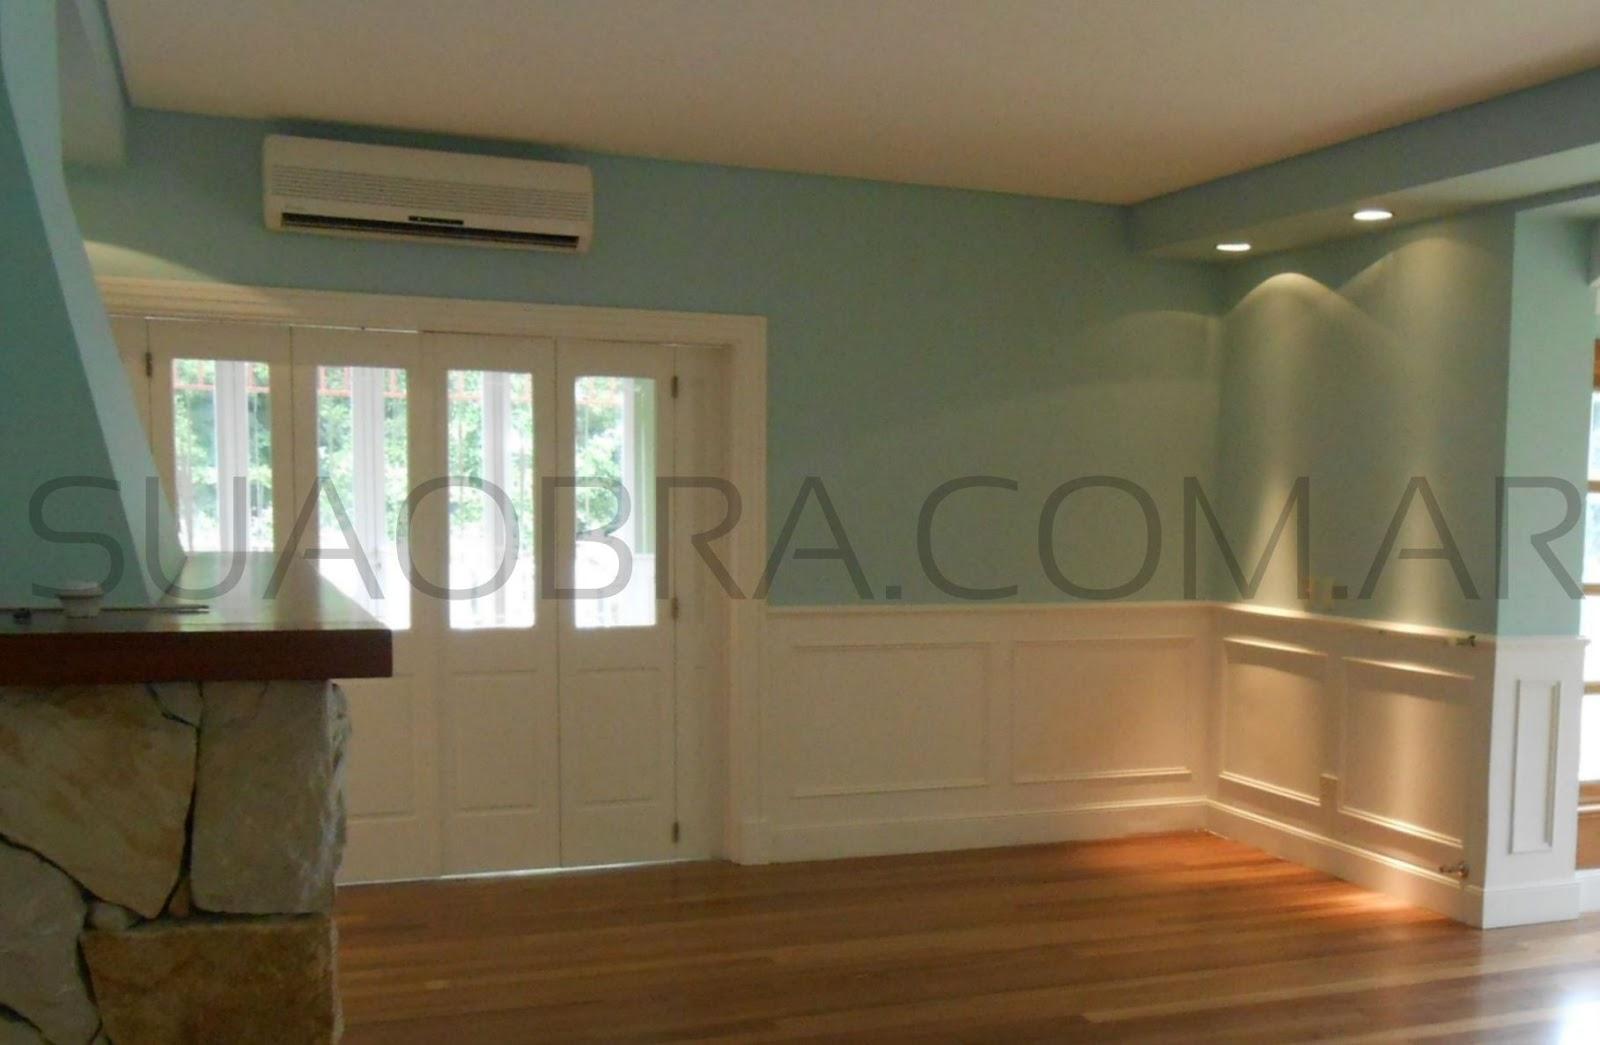 Pintura residencial pintura interior refacci n - Pinturas para madera interior ...